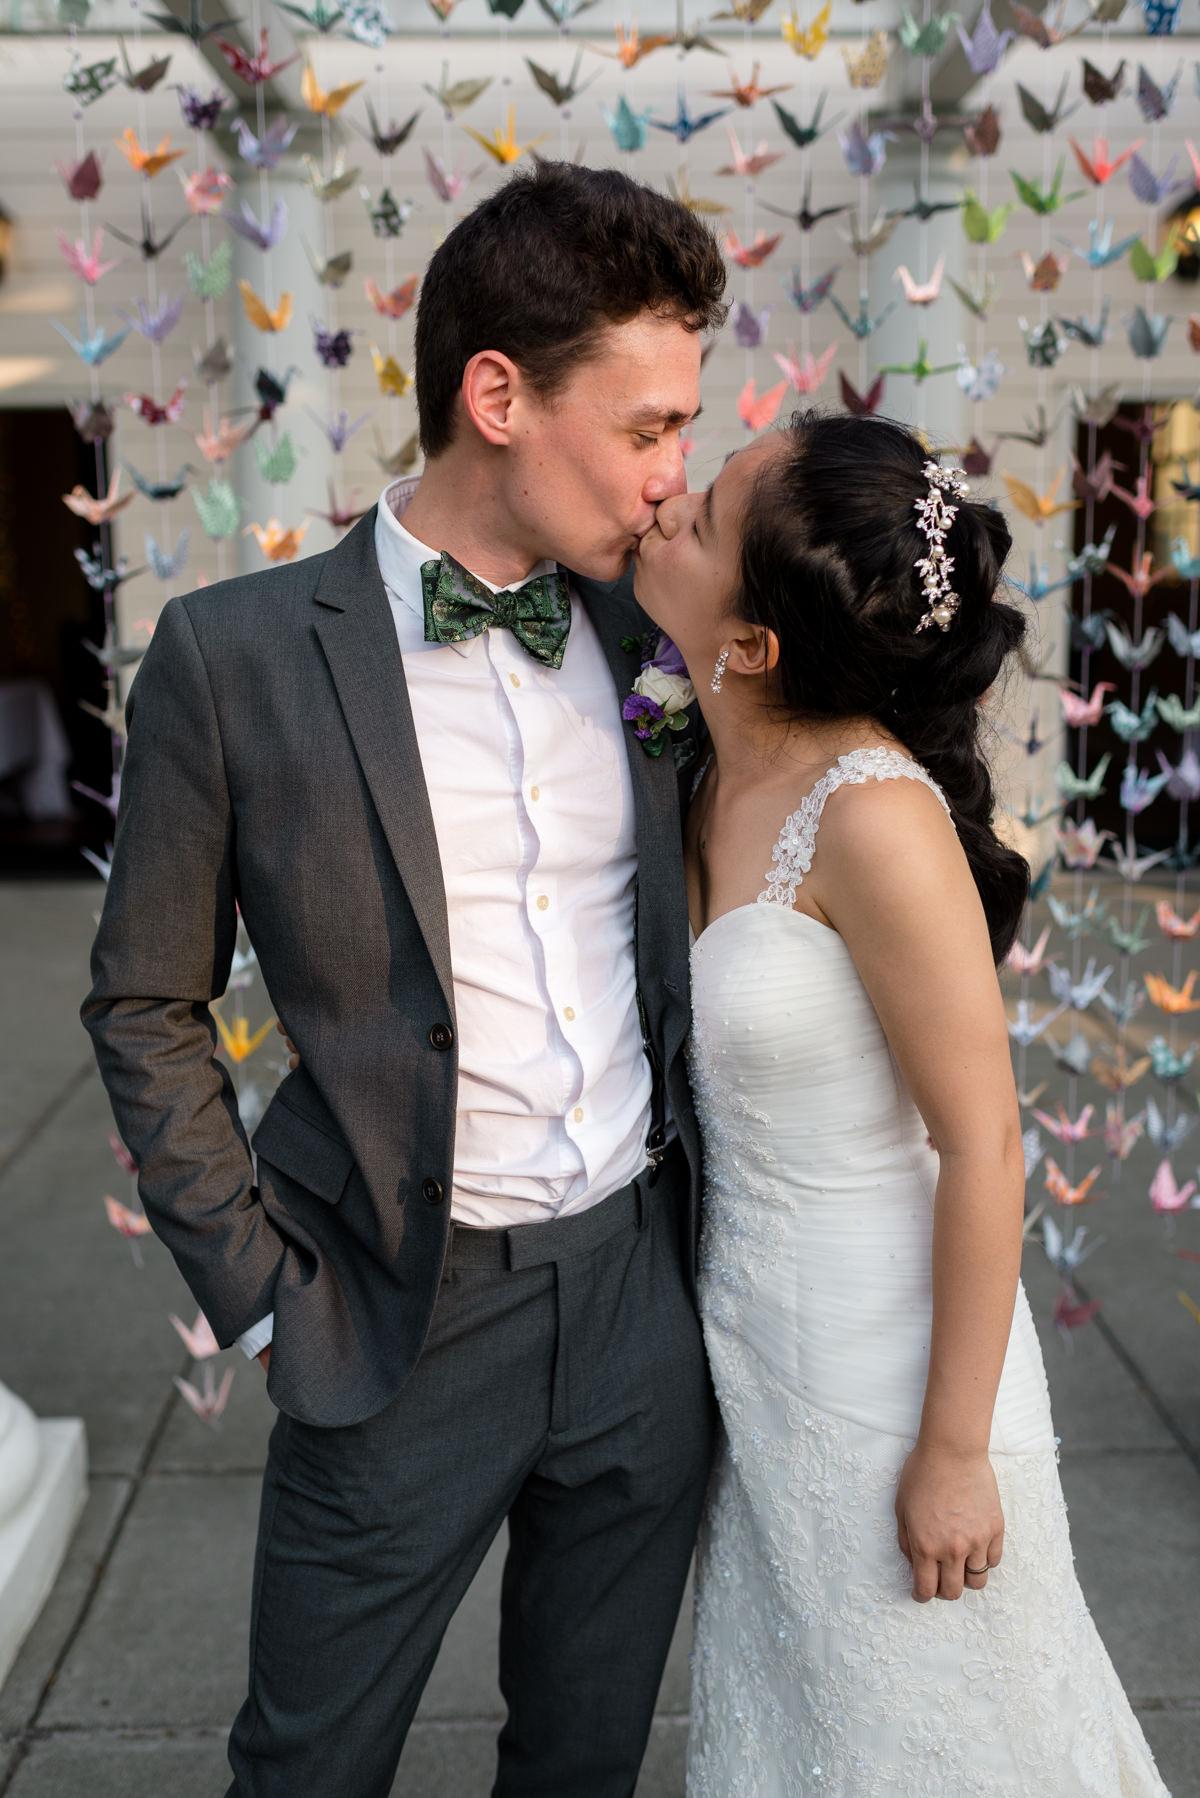 Andrew Tat - Documentary Wedding Photography - Heritage Hall - Kirkland, Washington - Grace & James - 86.JPG